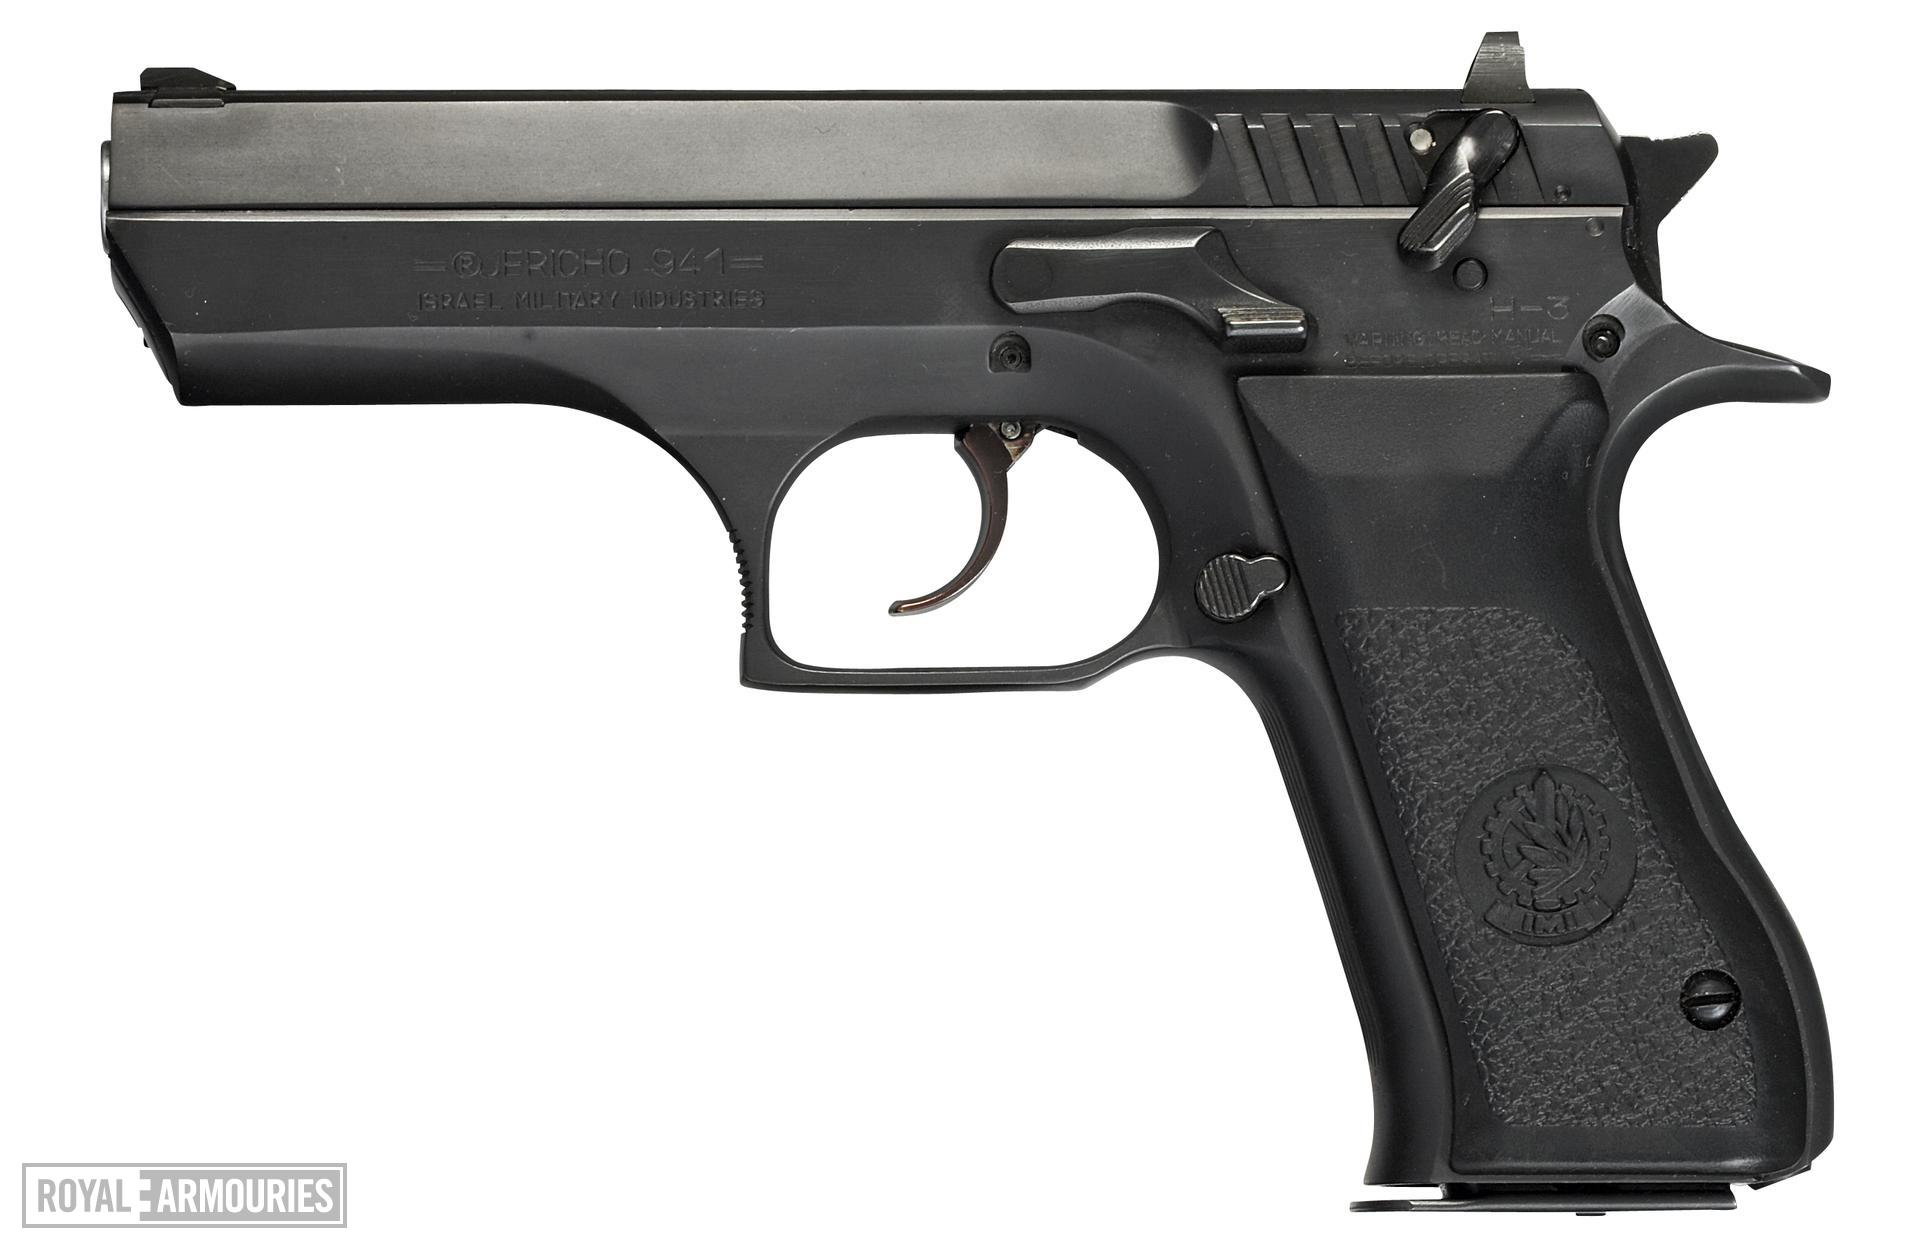 Centrefire self-loading pistol - IMI Jericho Model 941